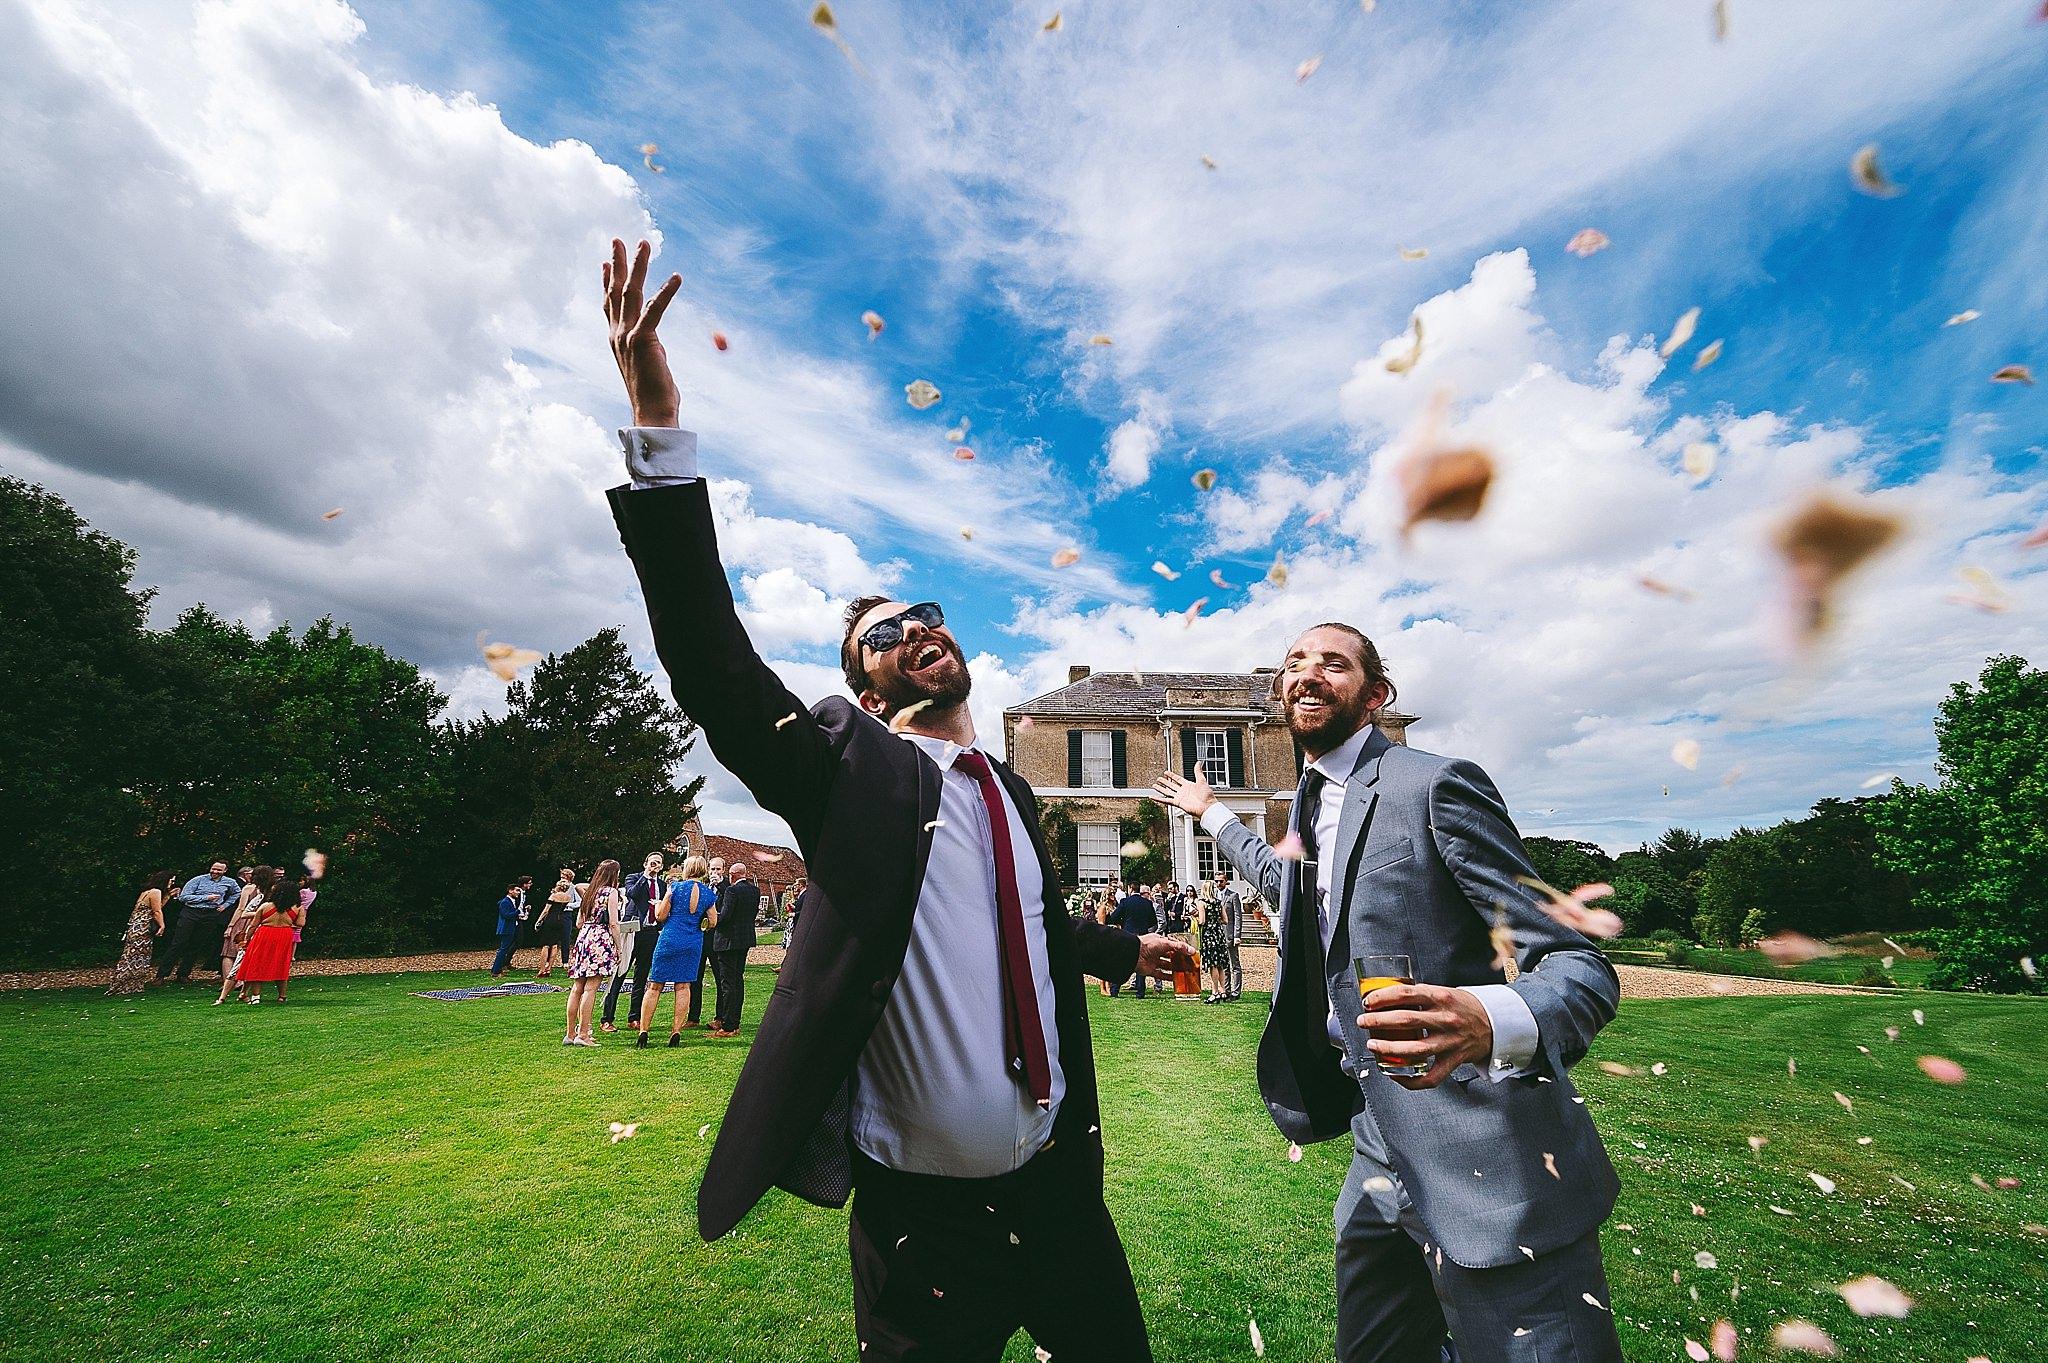 aga-tomaszek-wedding-photographer-cardiff-2016_1026